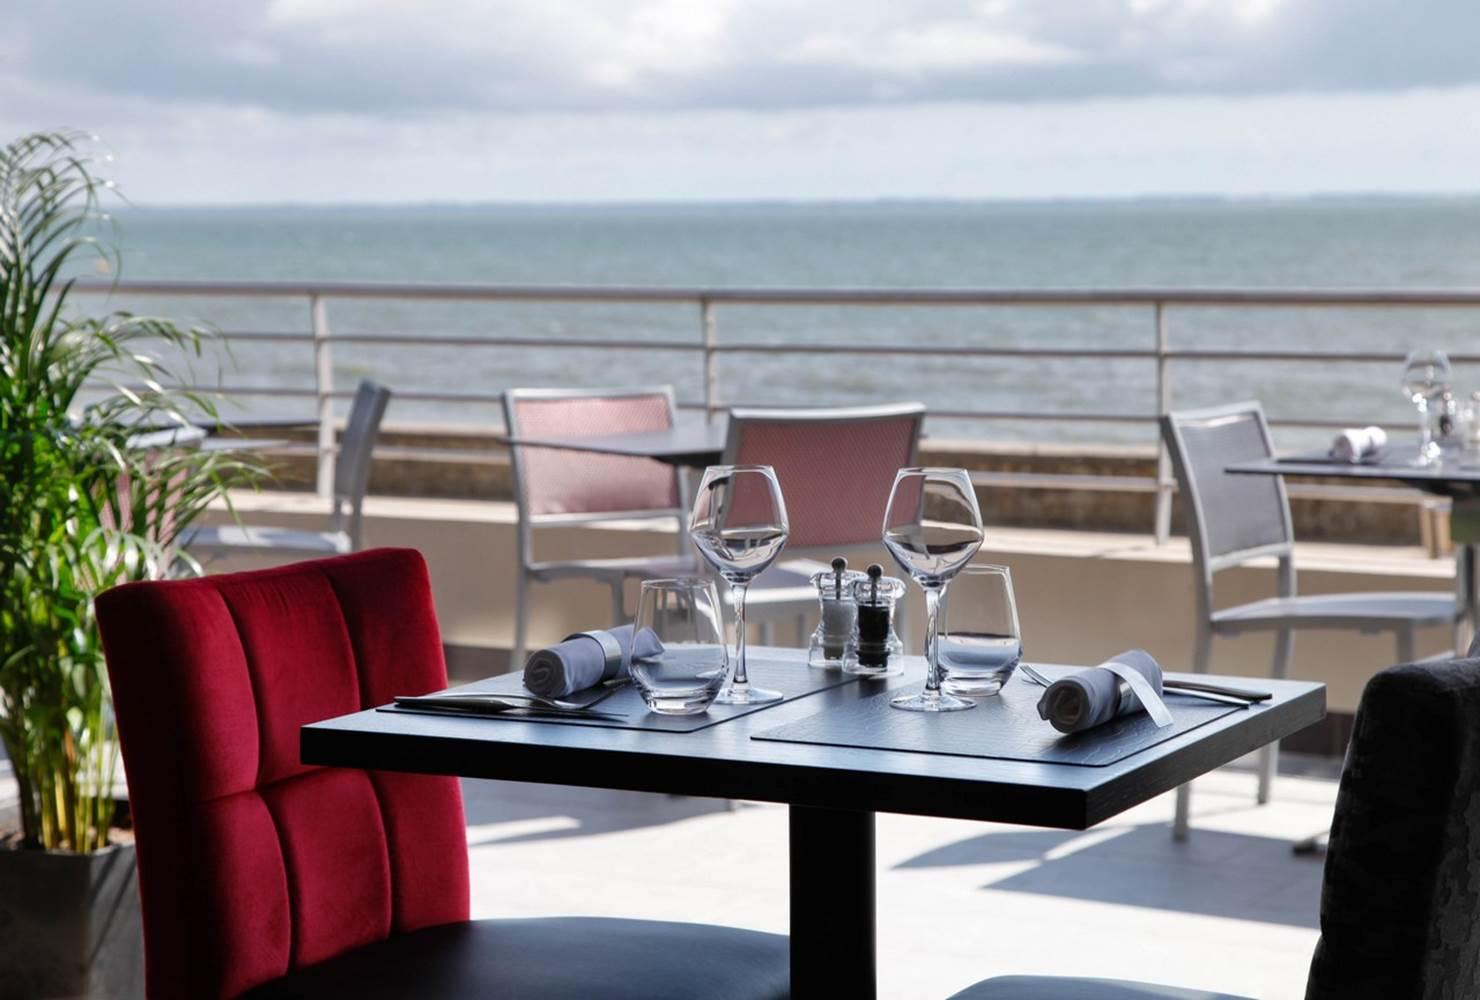 Restaurant Hôtel de la Plage terrase vue mer © Hôtel-Restaurant de La Plage-  terrase vue mer - Damgan - Bretagne sud